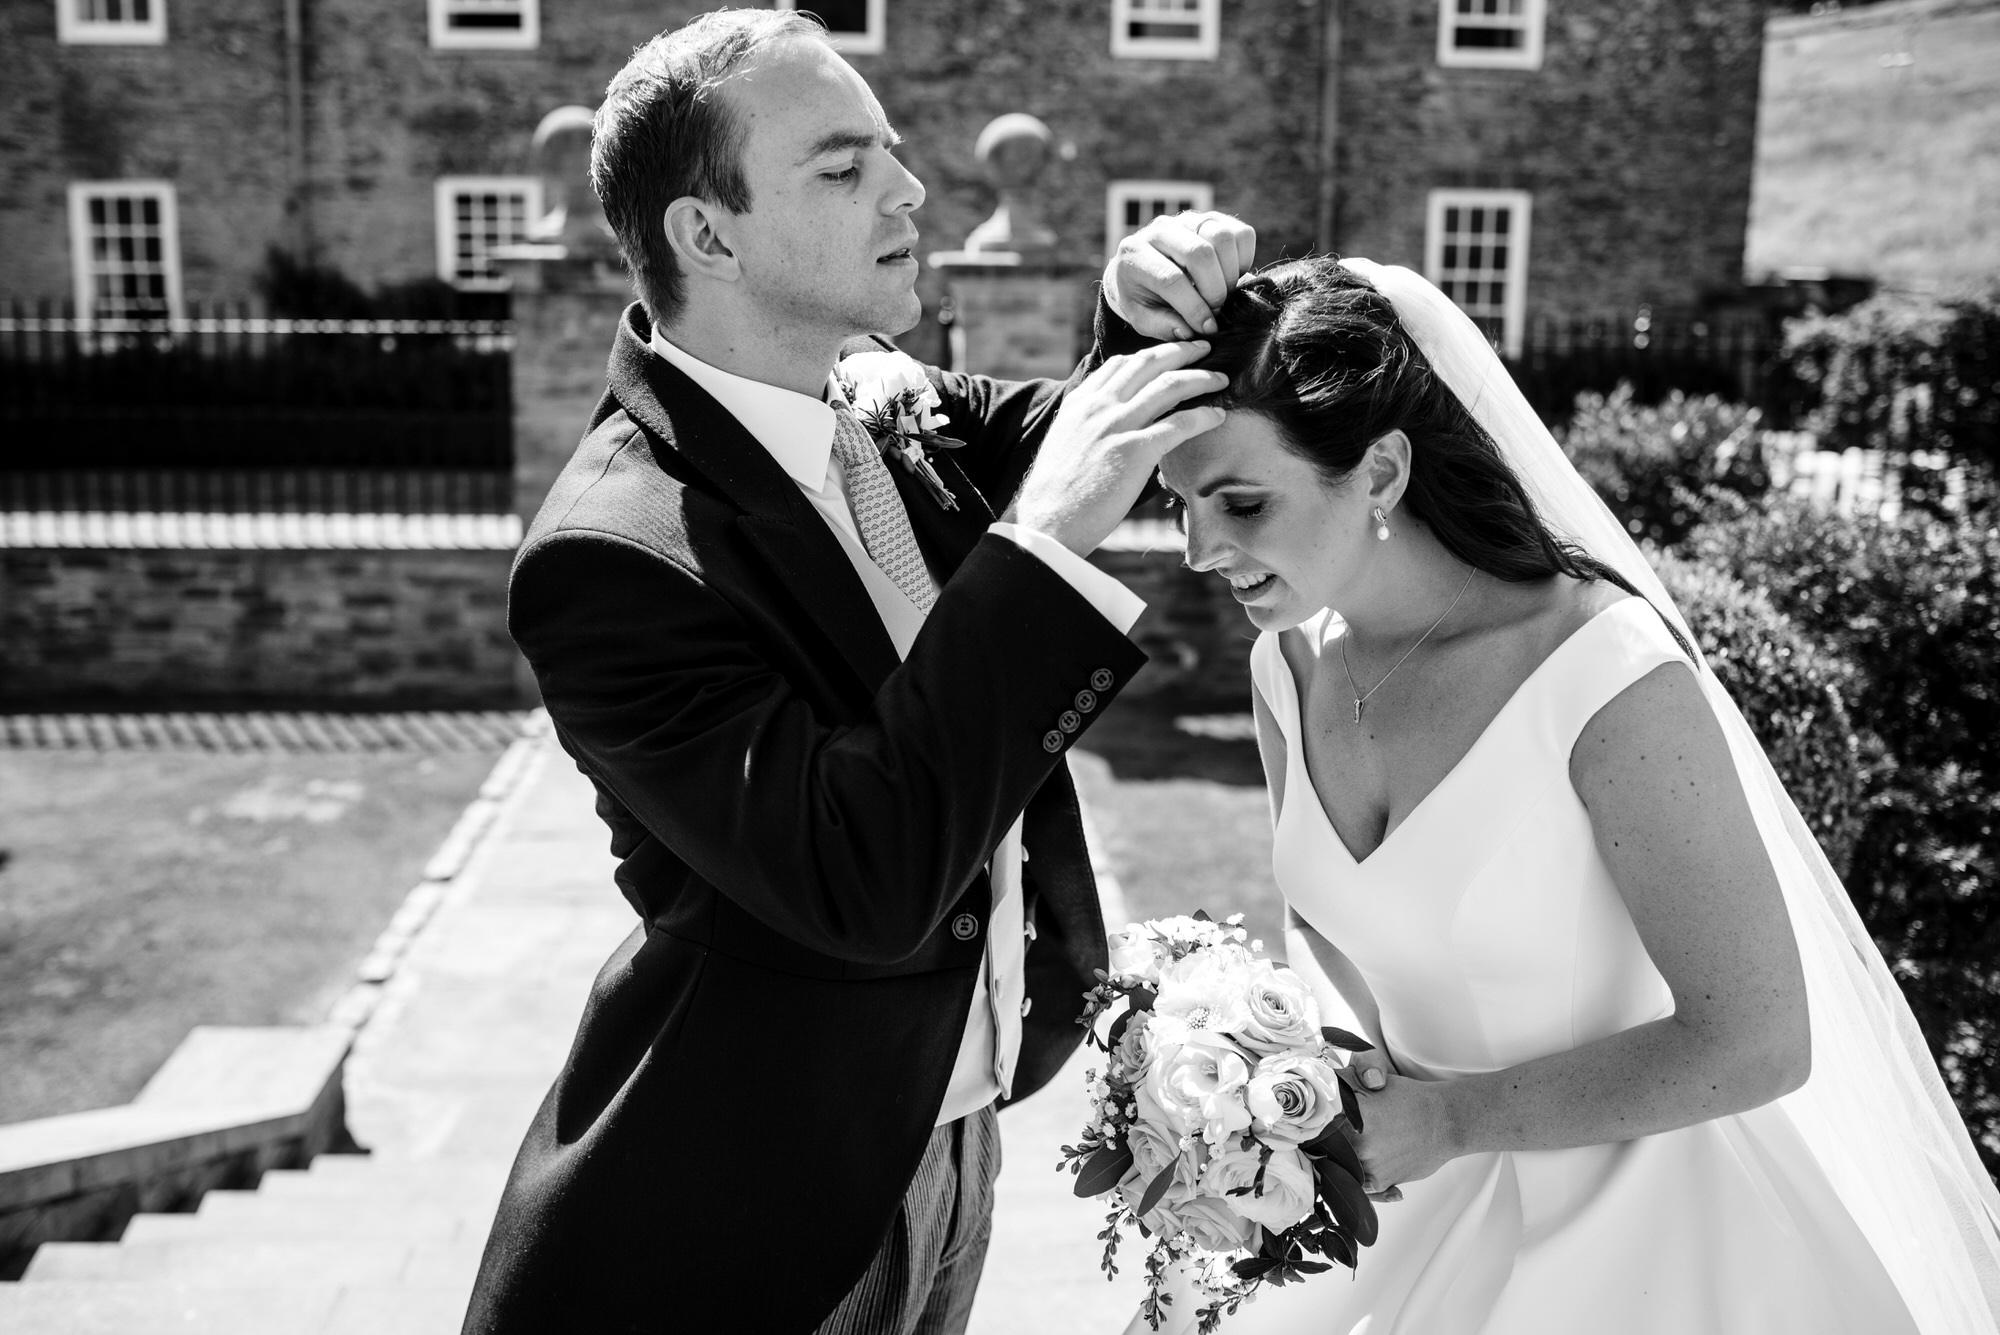 Shilstone wedding photographer 19